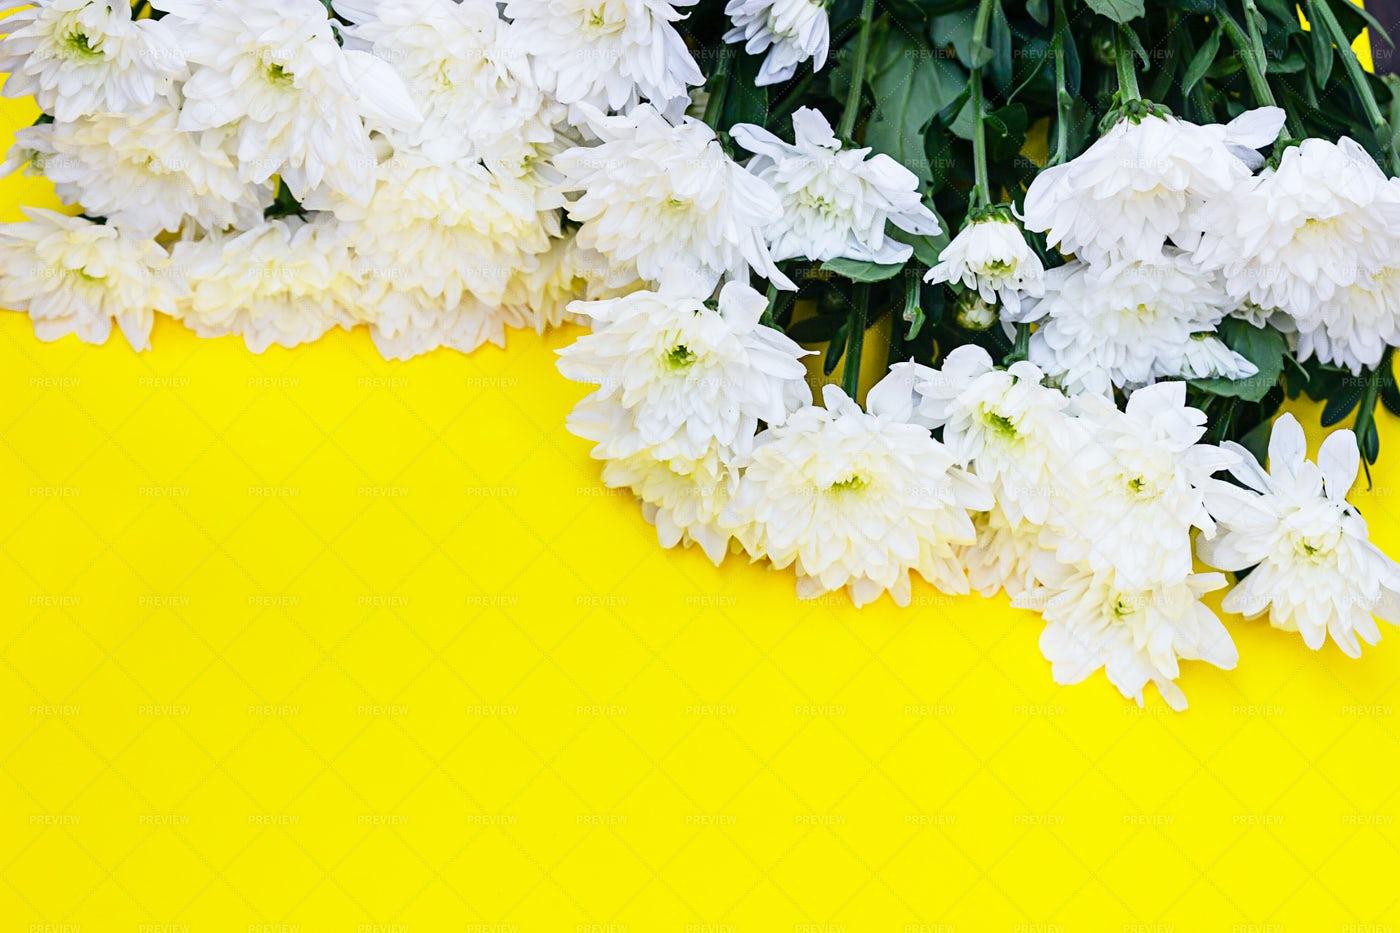 Many Chrysanthemum Flowers: Stock Photos